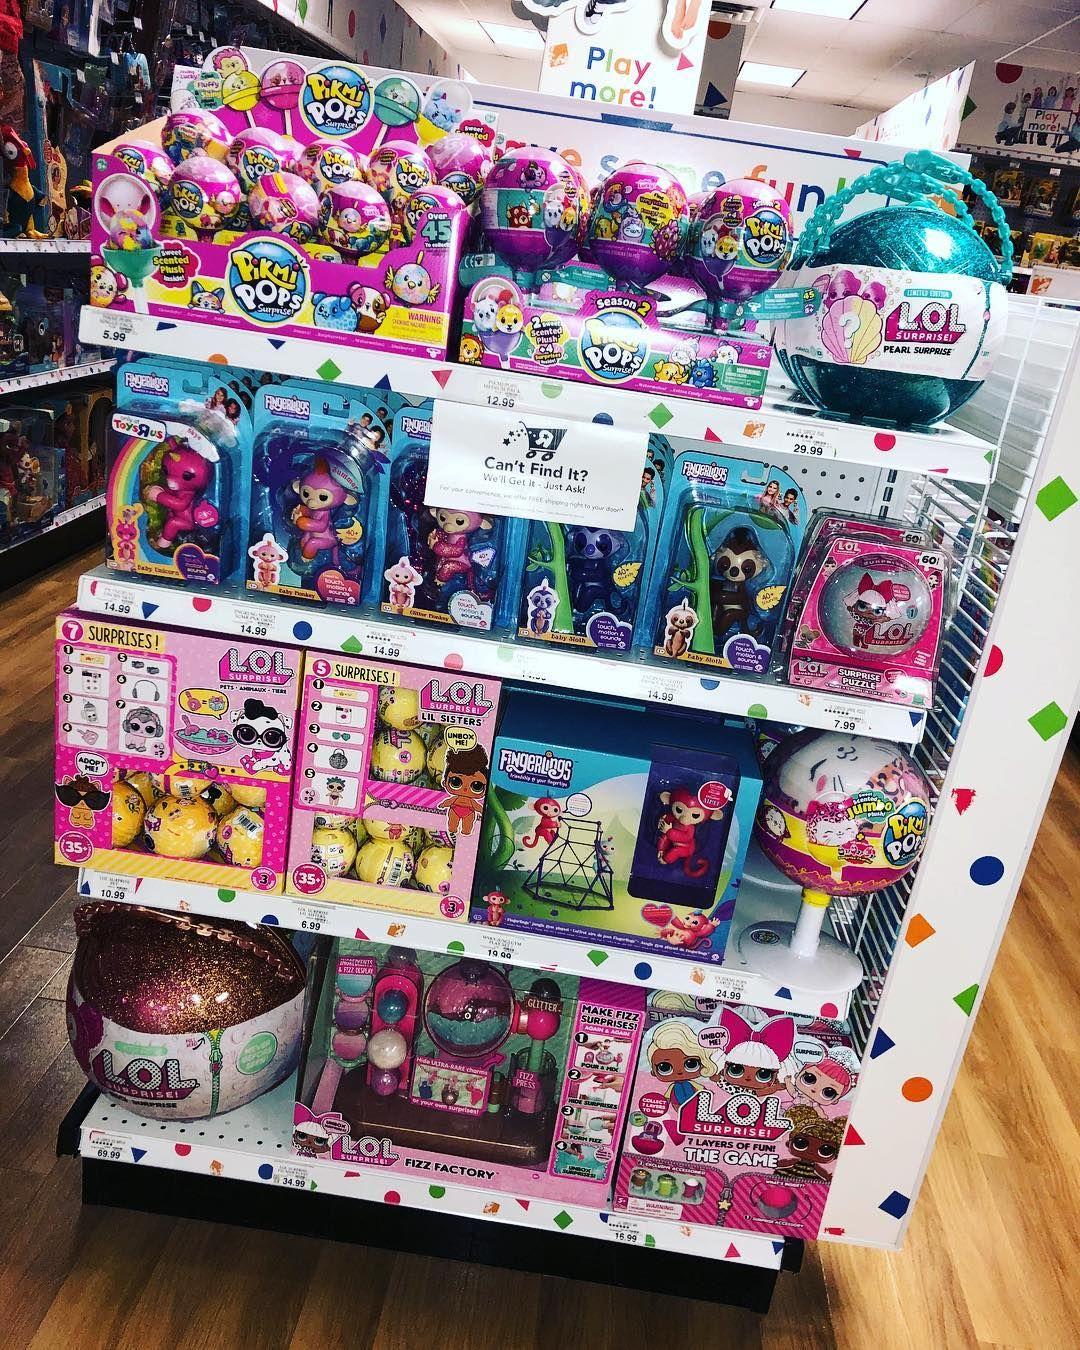 Lol Surprises Pikmi Pops Fingerlings D12r3 Toysrus Lolsurprise Pikmipop Fingerlings Lol Dolls Diy Jar Crafts Fun Crafts For Kids